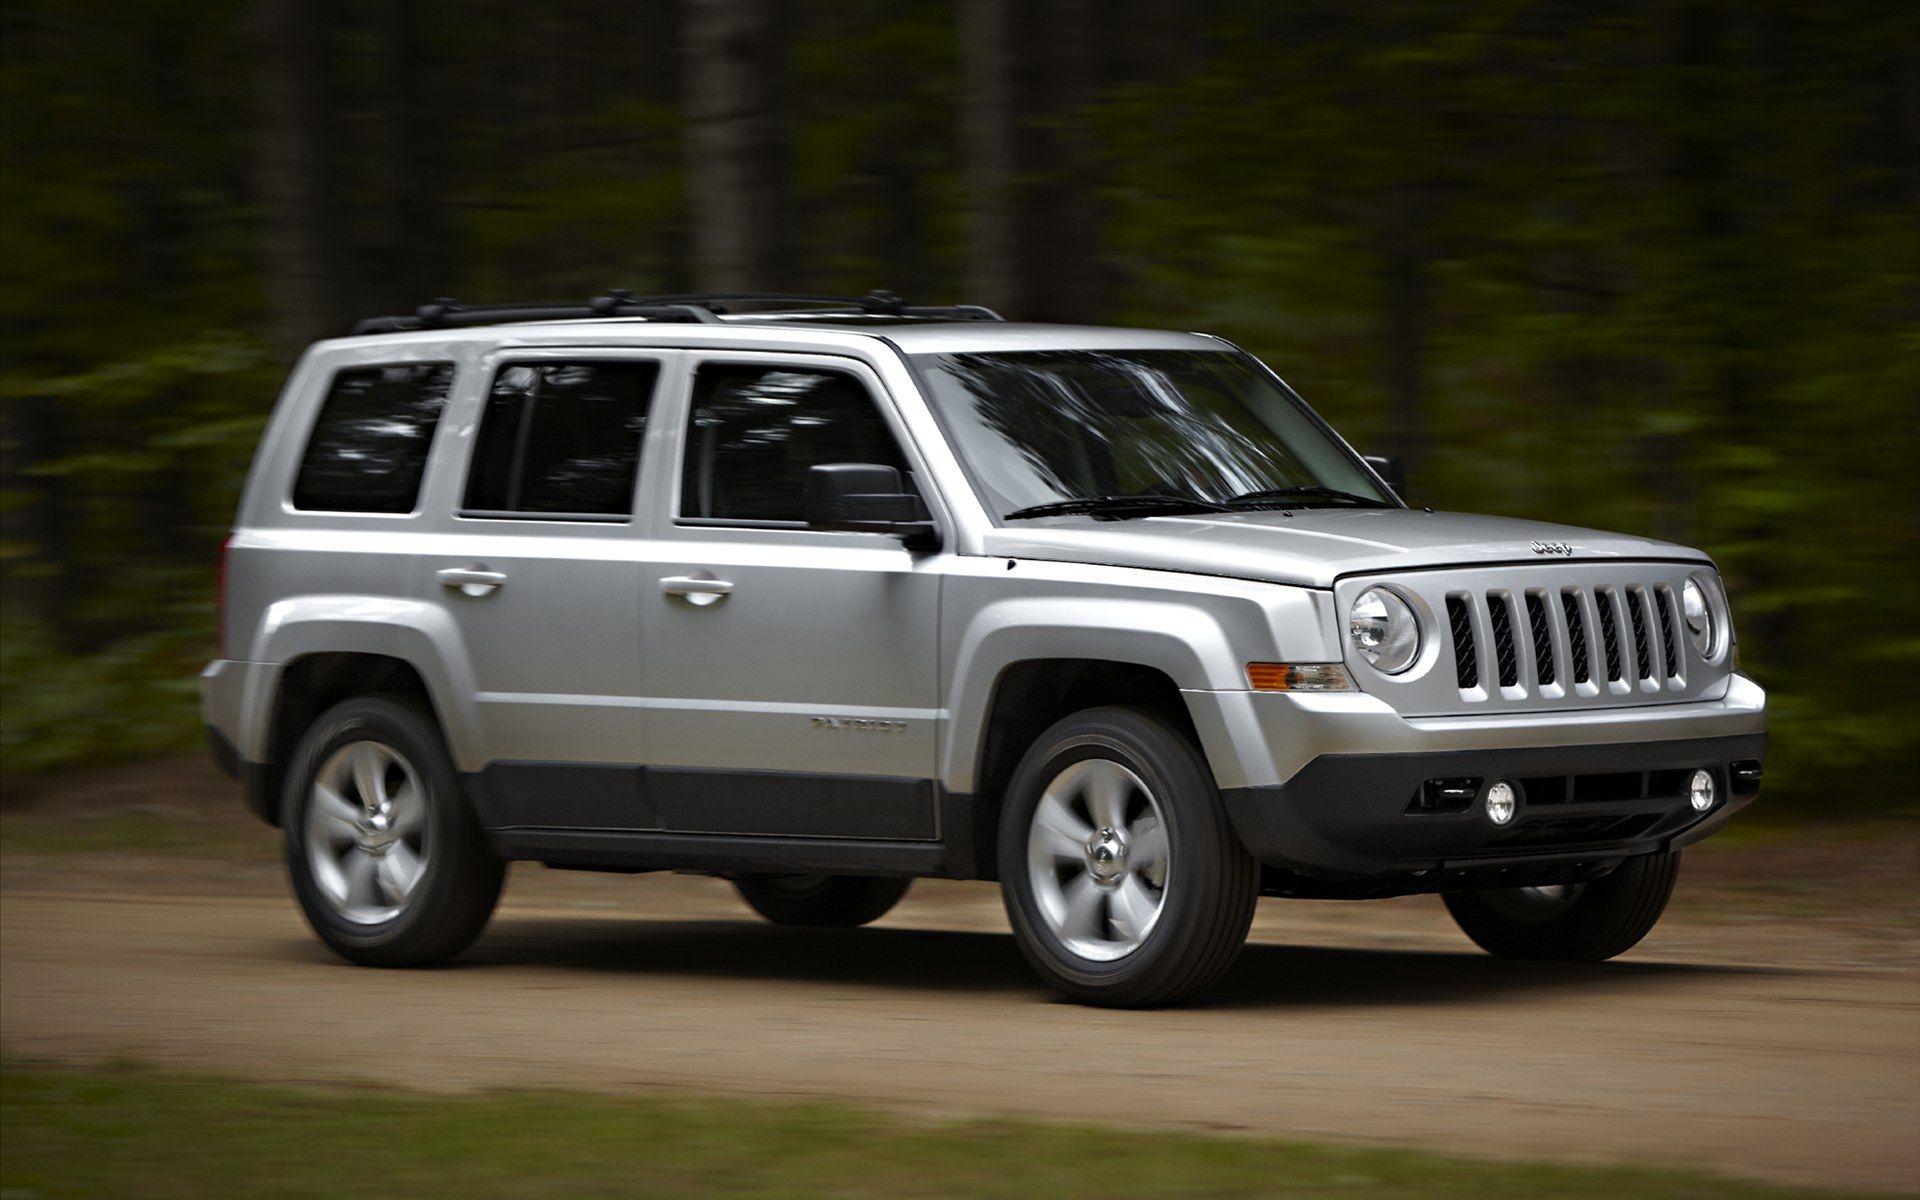 2012 jeep patriot this 2012 jeep patriot the 2012 jeep patriot is